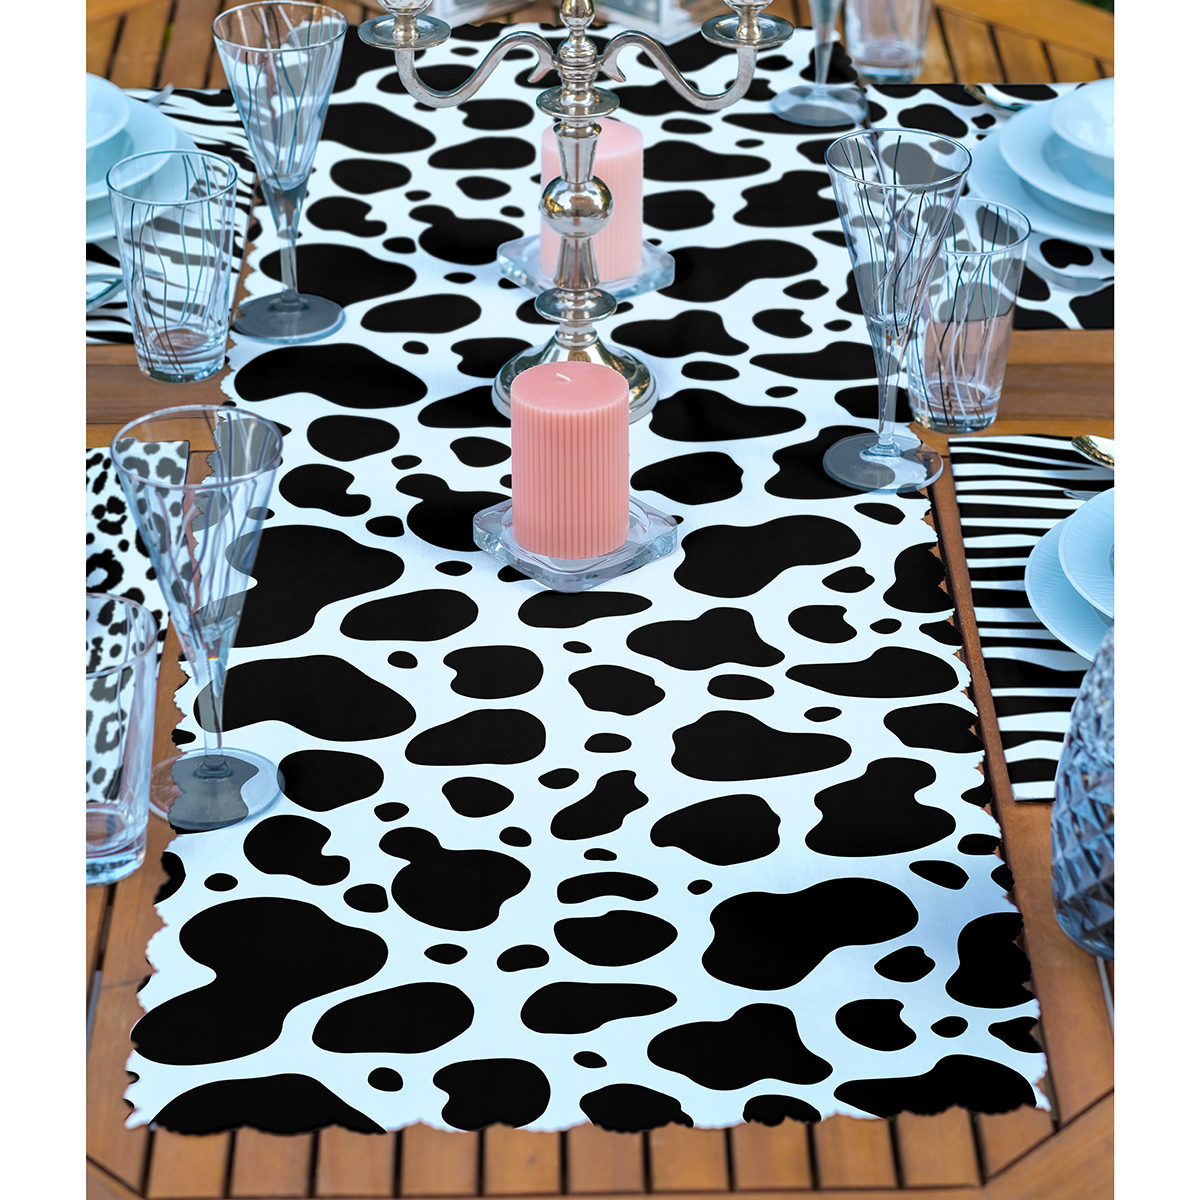 4+1 Siyah Beyaz Zebra Desenli Amerikan Servis & Runner Seti Realhomes